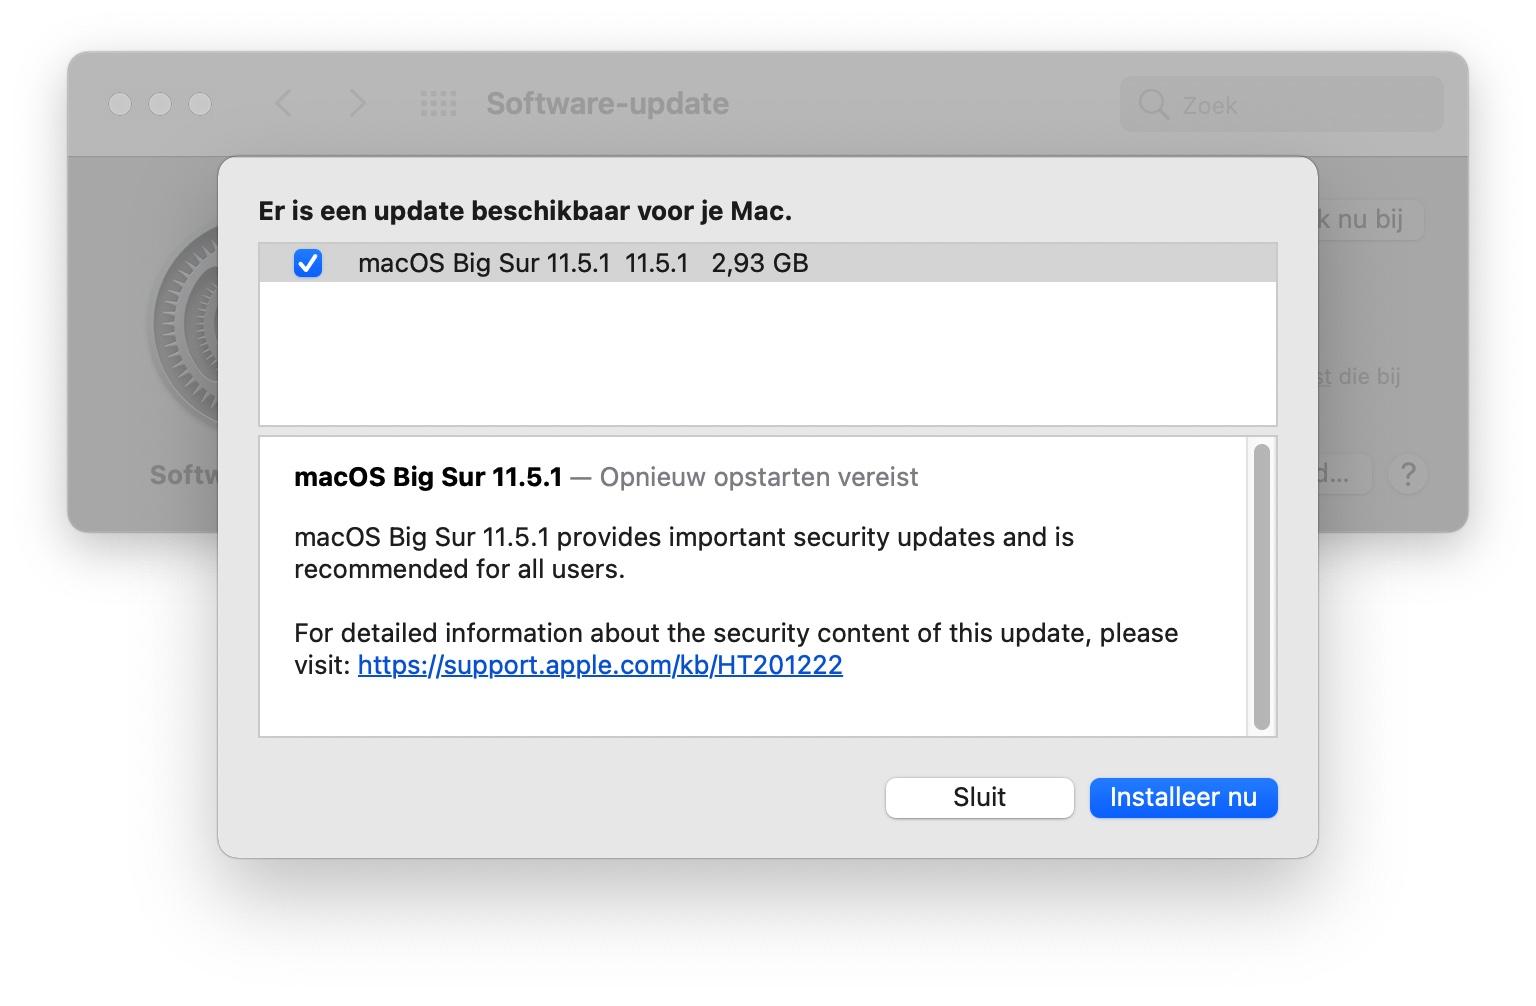 https://www.macfreak.nl/modules/news/images/zArt.macOSBigSur11.5.1Update.jpg